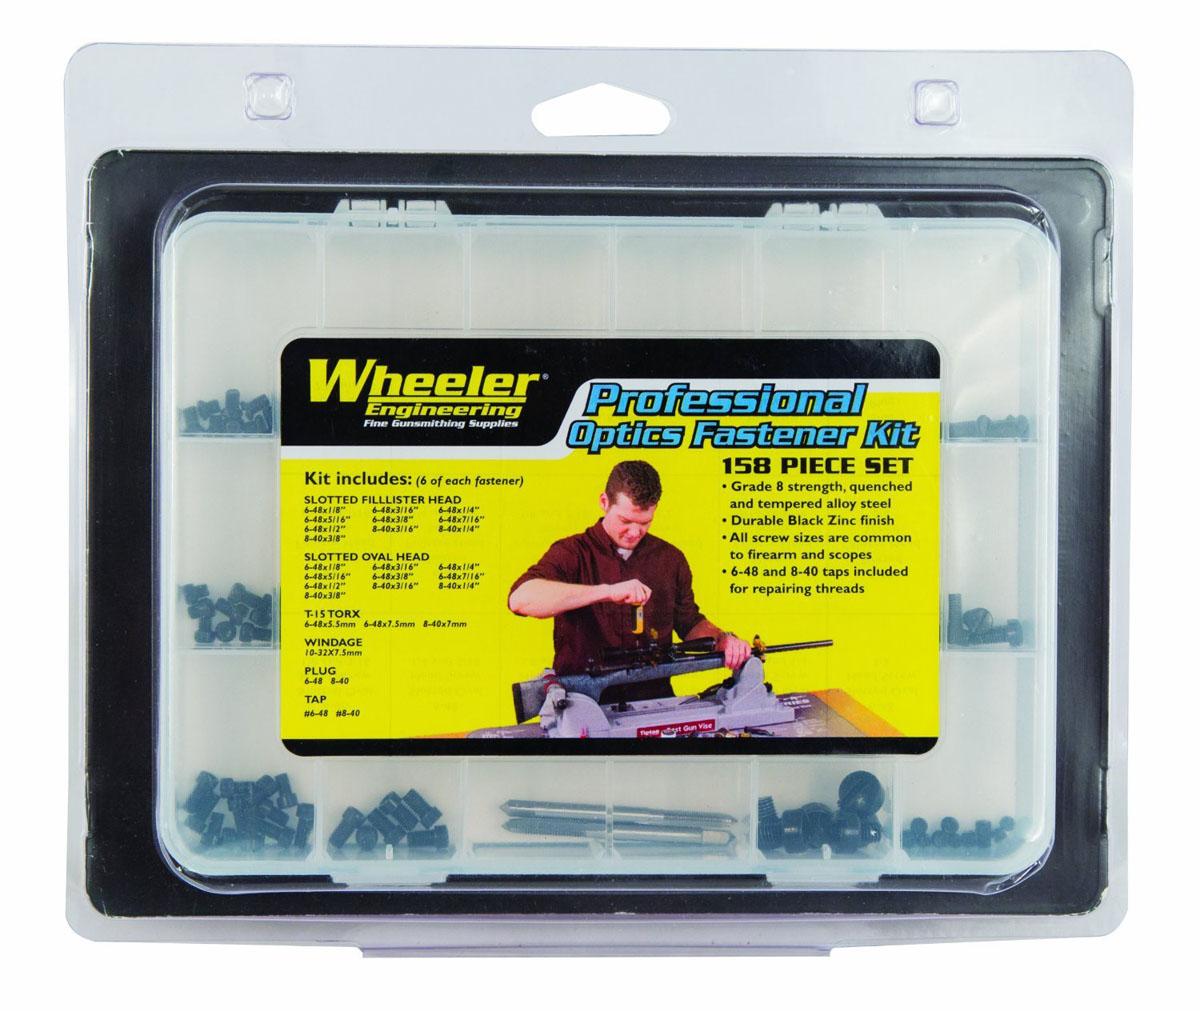 Wheeler Engineering Professional Optics Fastener Kit